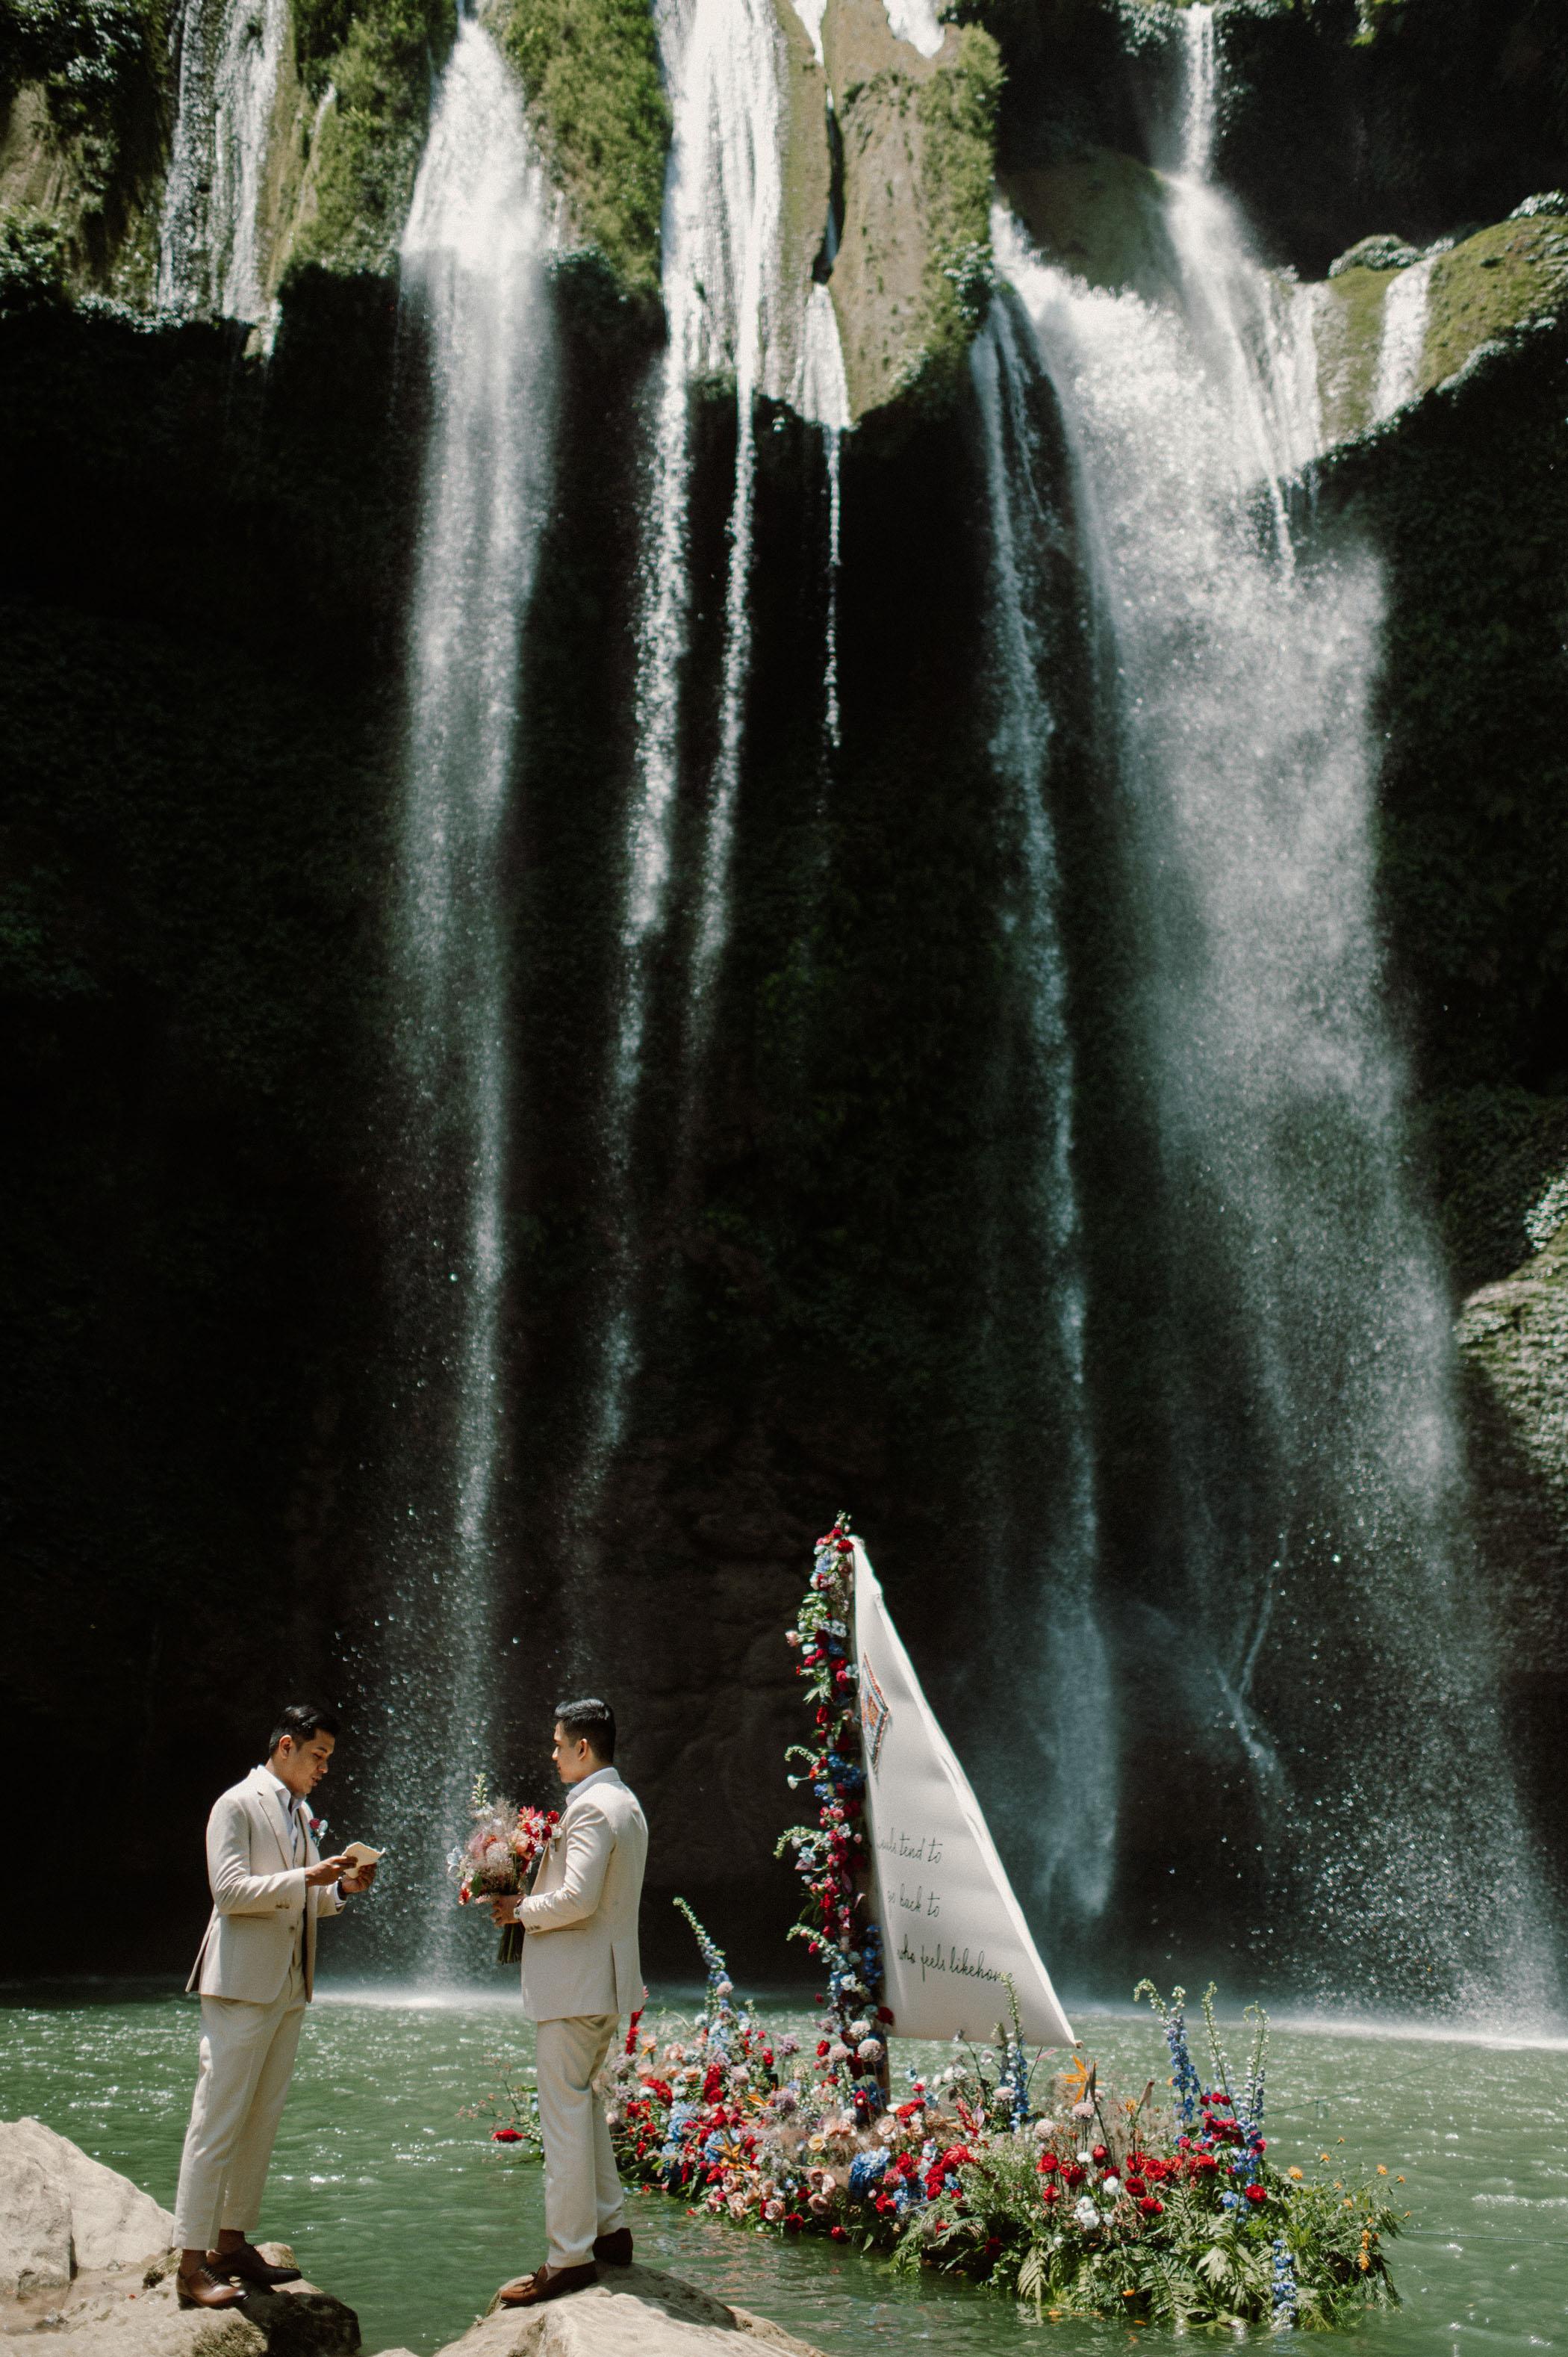 Moc Chau Waterfall Elopement